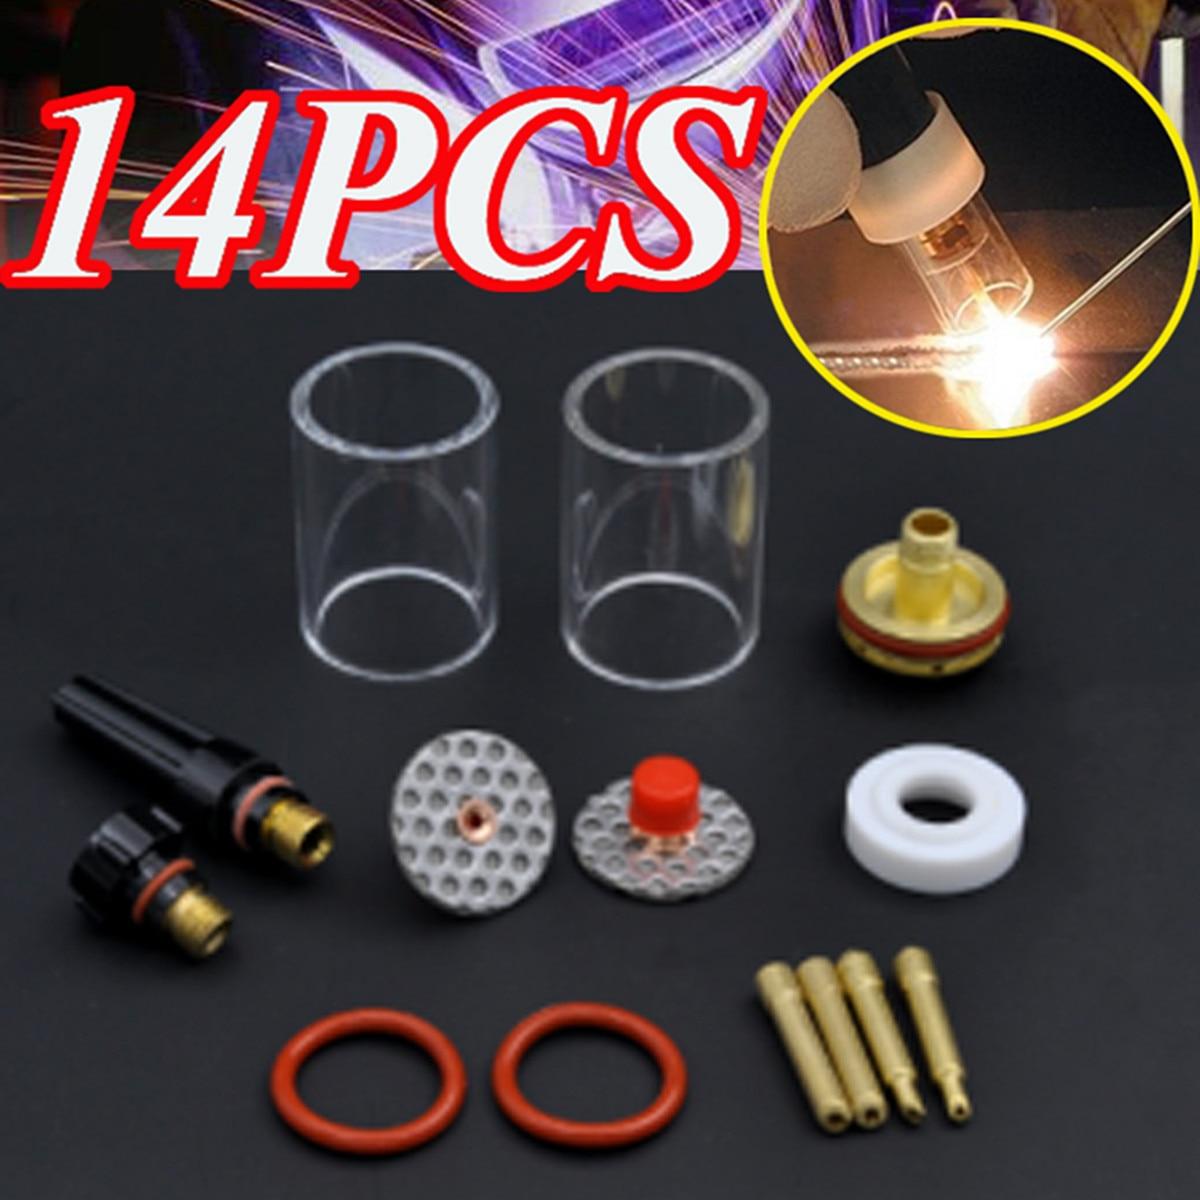 1SET 14PCS TIG Welding Torch Stubby Gas Lens Glass Pyrex Cup Kit 3.2mm 1/8 For WP17/18/26 Welding Series 1set 14pcs tig welding torch stubby gas lens glass pyrex cup kit 3 2mm 1 8 for wp17 18 26 welding series